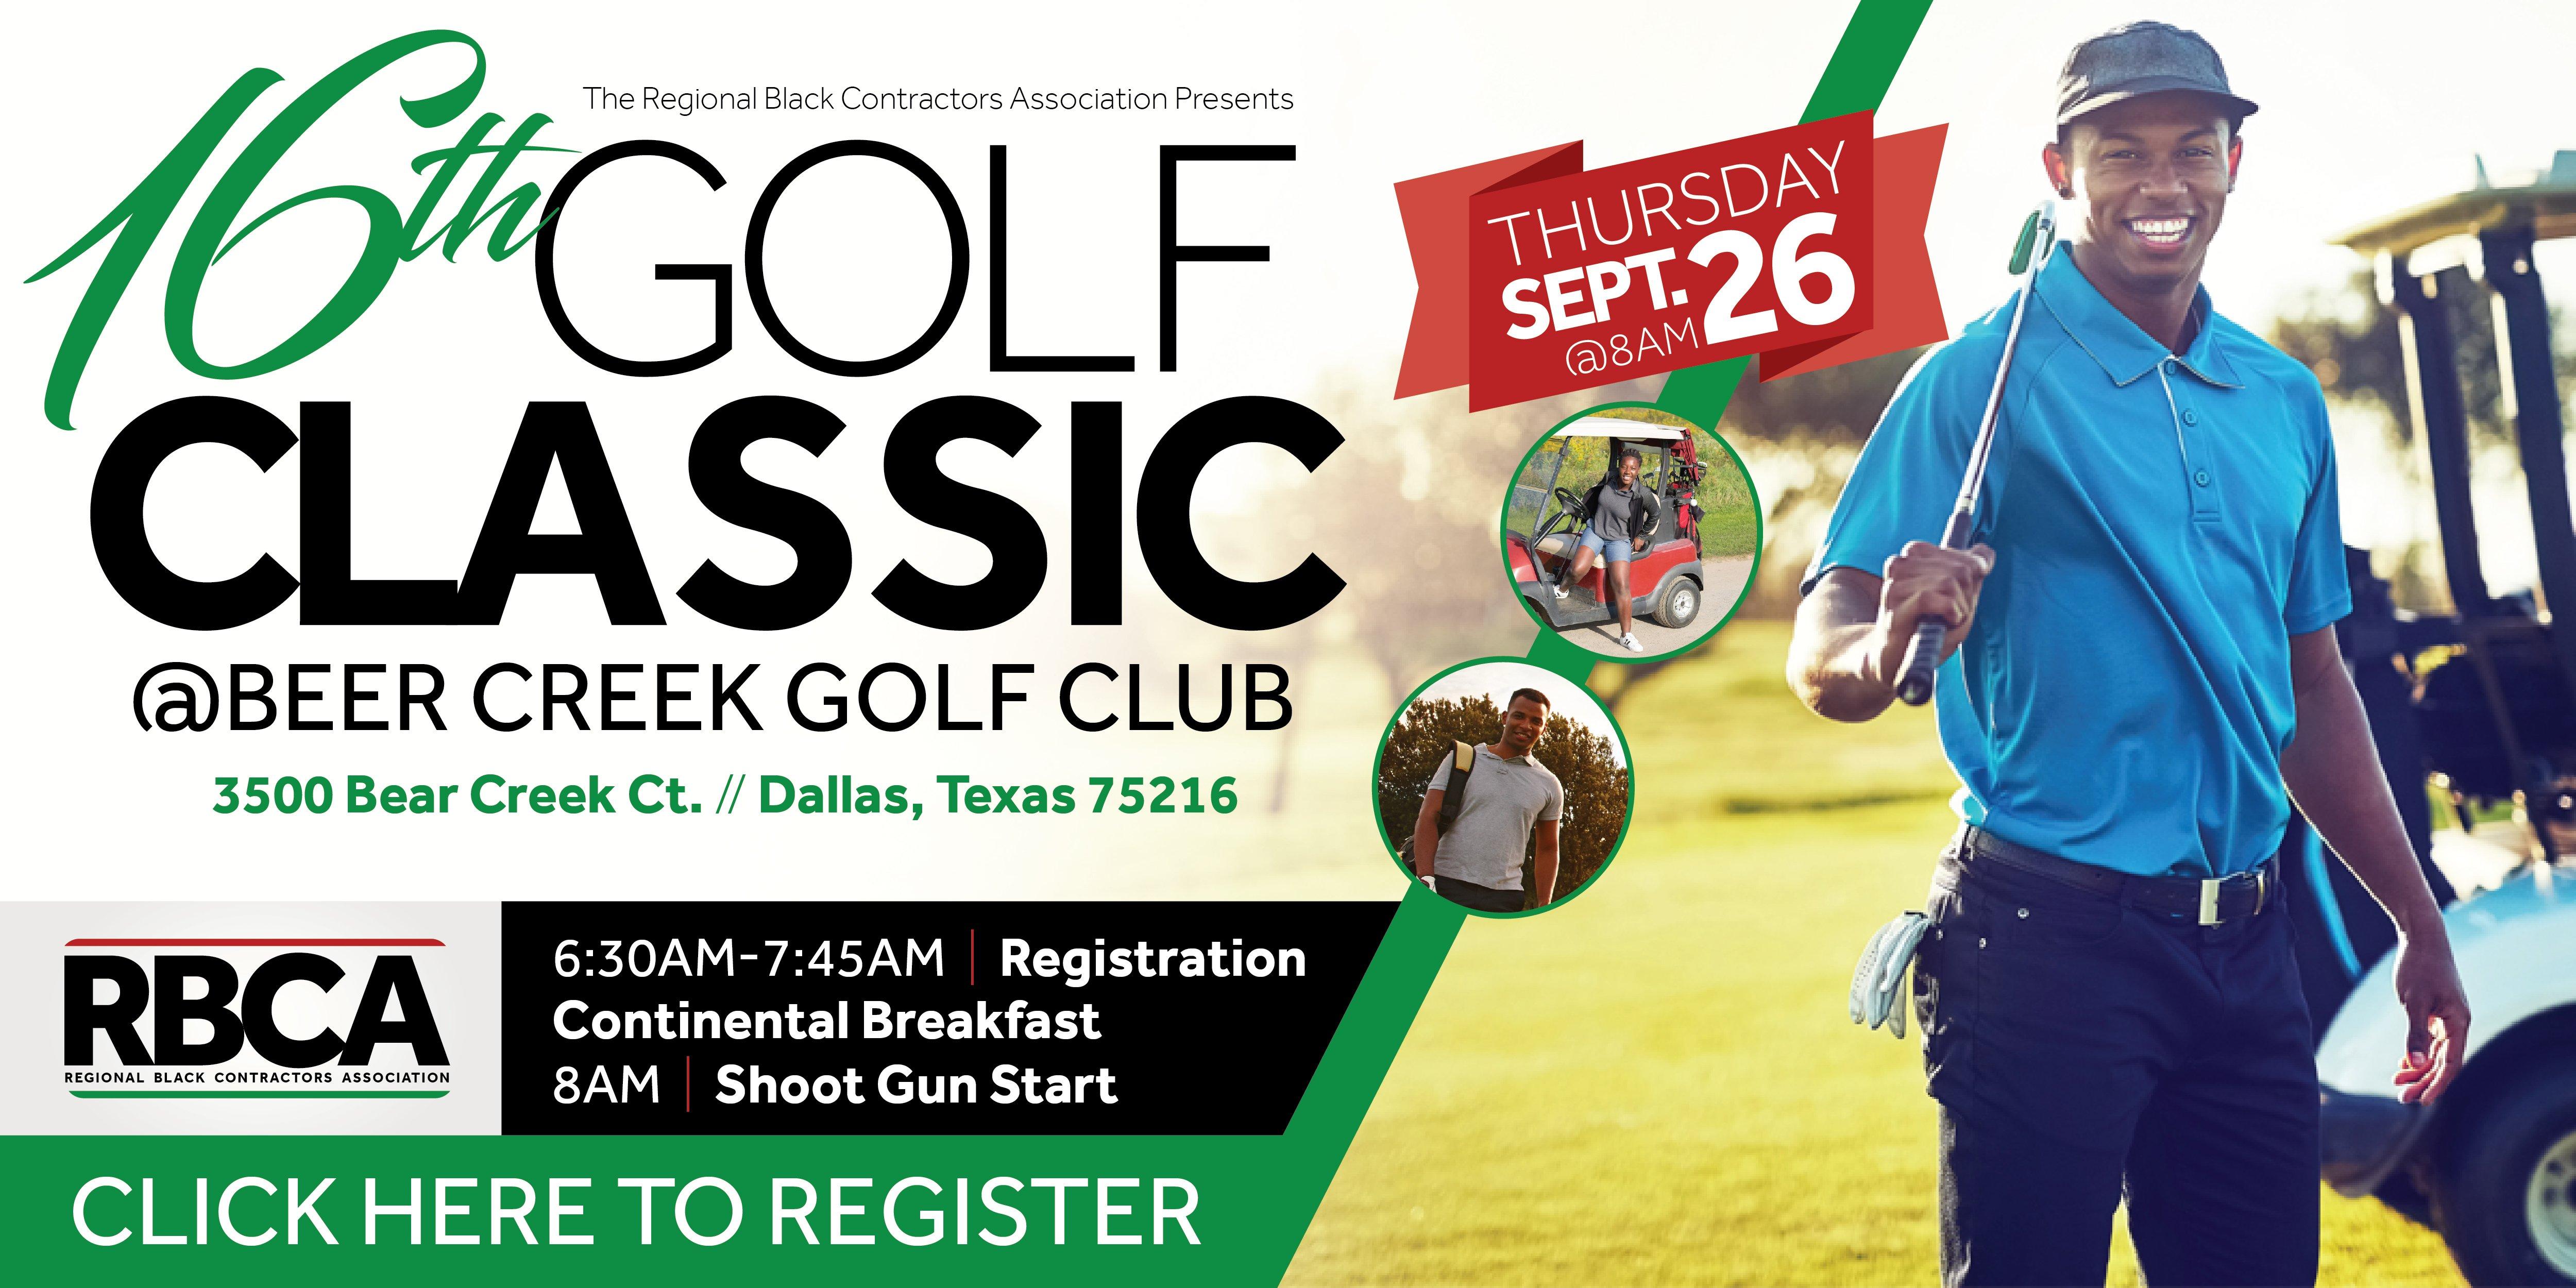 RBCA_Golf Classic_flyer-01